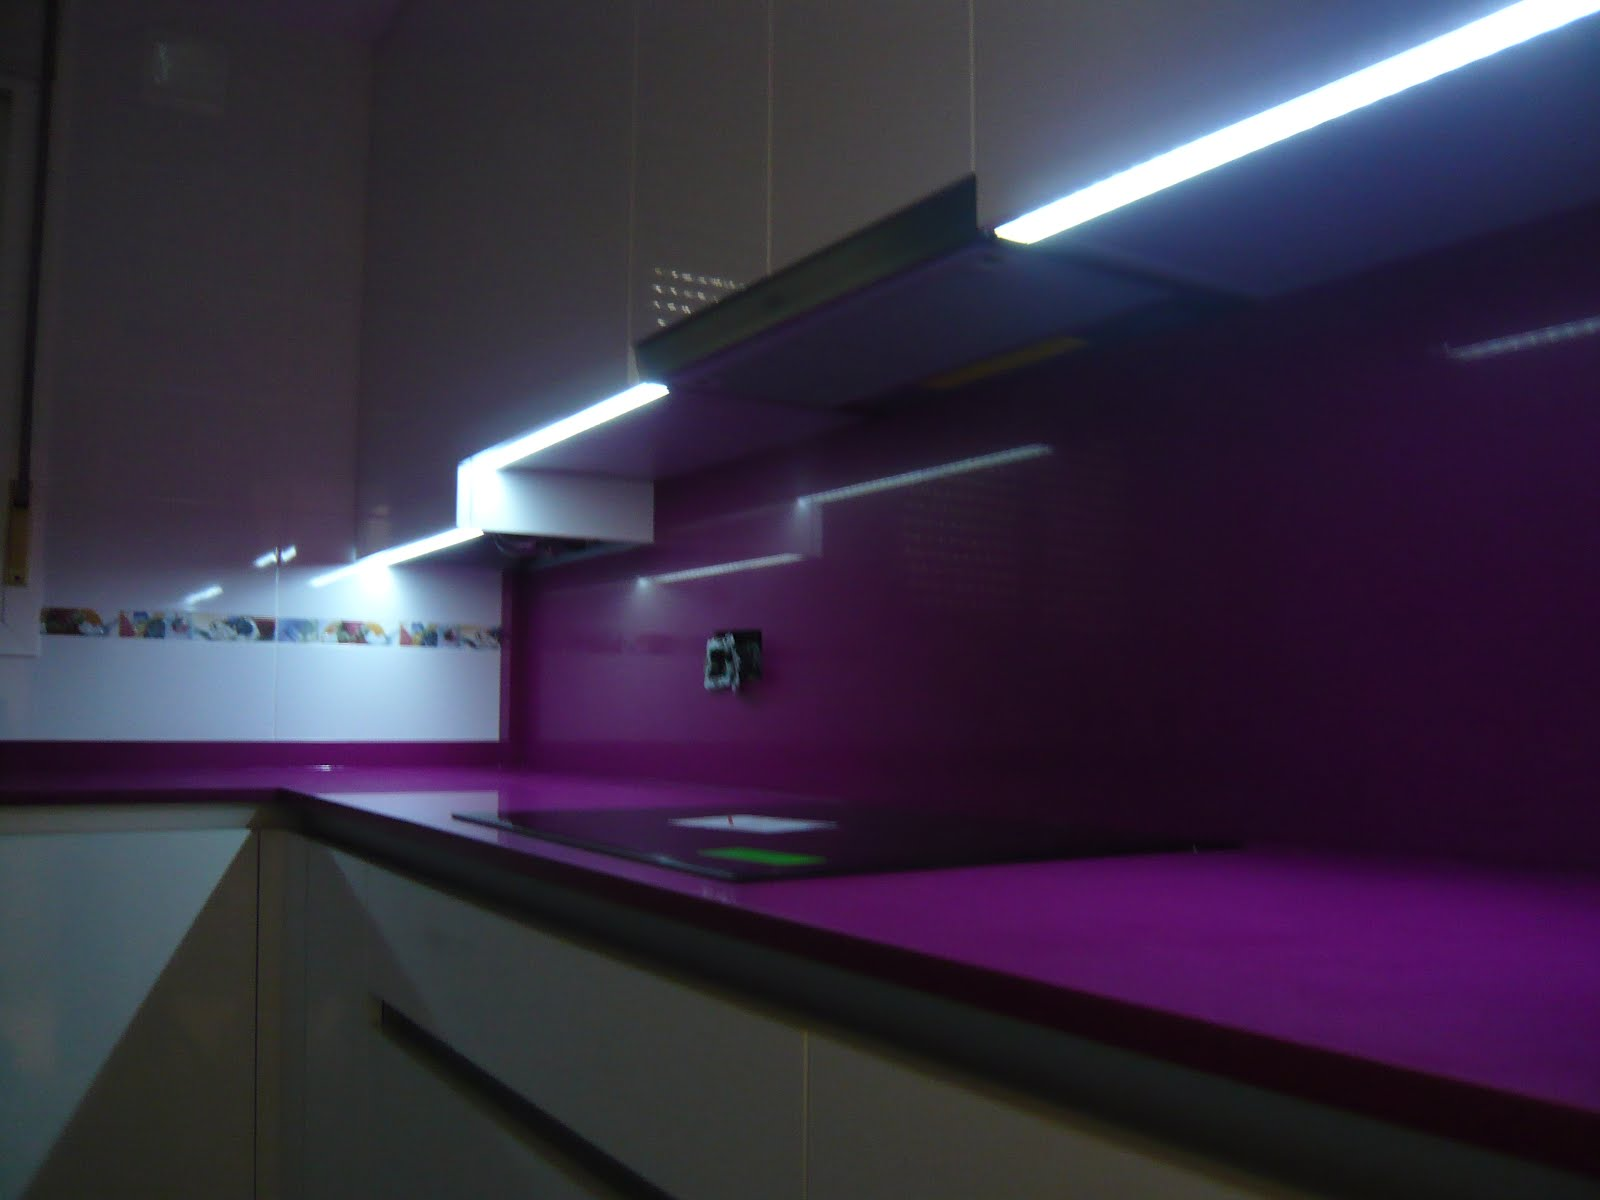 Led Para Muebles De Cocina. Gallery Of Perfil Gola Luz Led Para ...